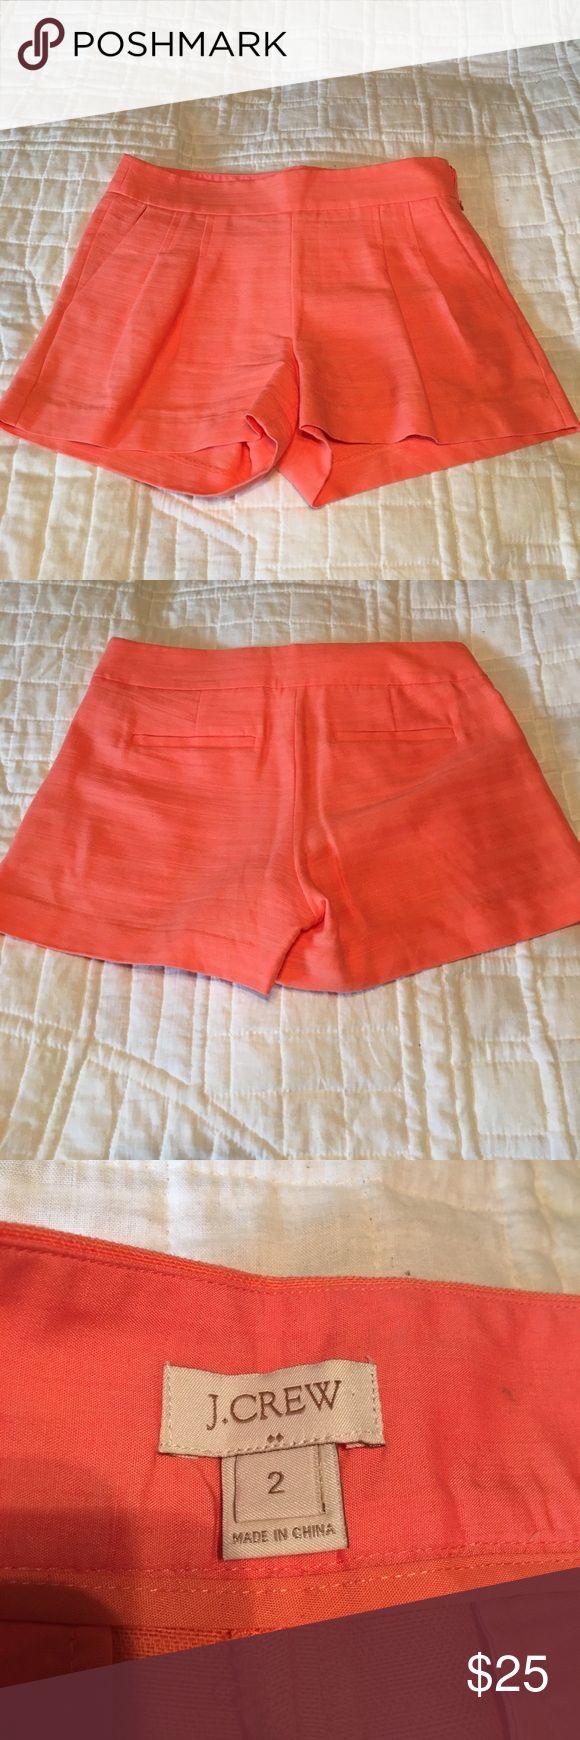 J. Crew Factory pleated coral shorts, sz 2 J. Crew Factory coral cotton/linen pleated shorts with side zipper. Size 2. J. Crew Factory Shorts